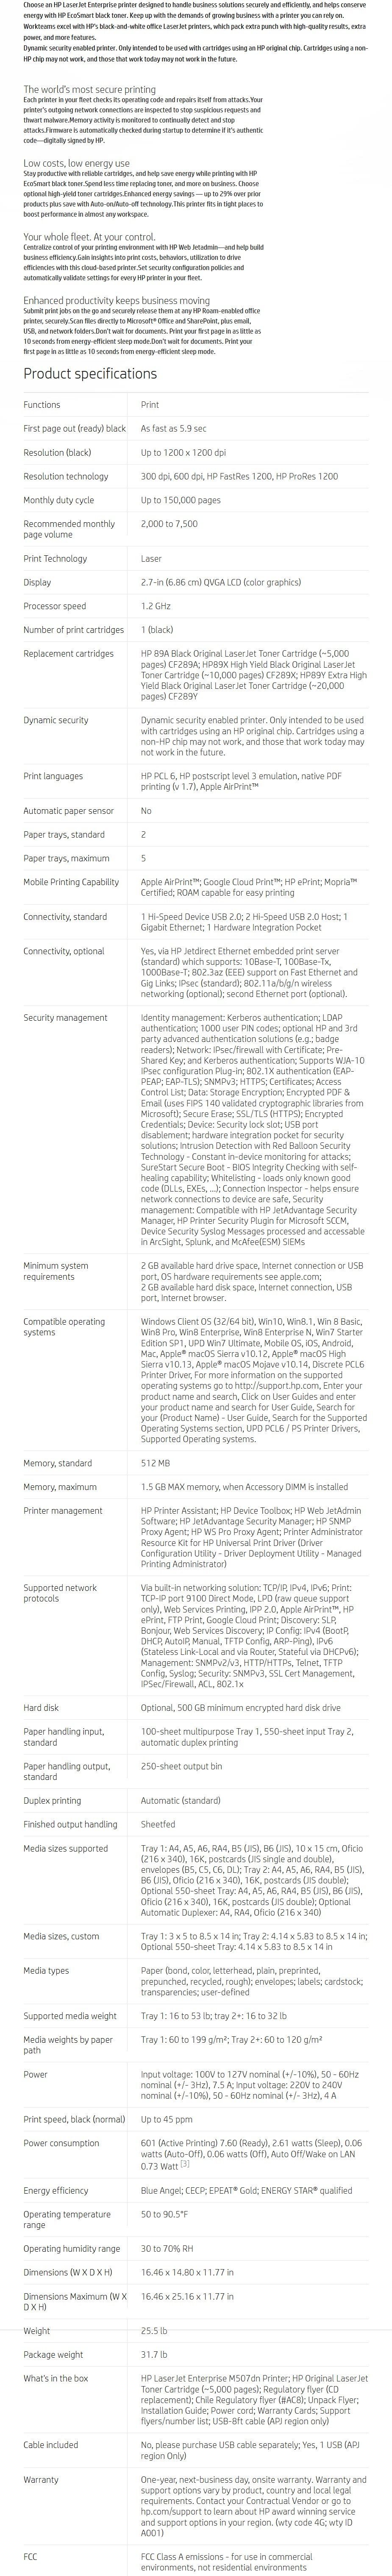 HP LaserJet Enterprise M507dn Monocolour Wireless Laser Printer - Desktop Overview 1